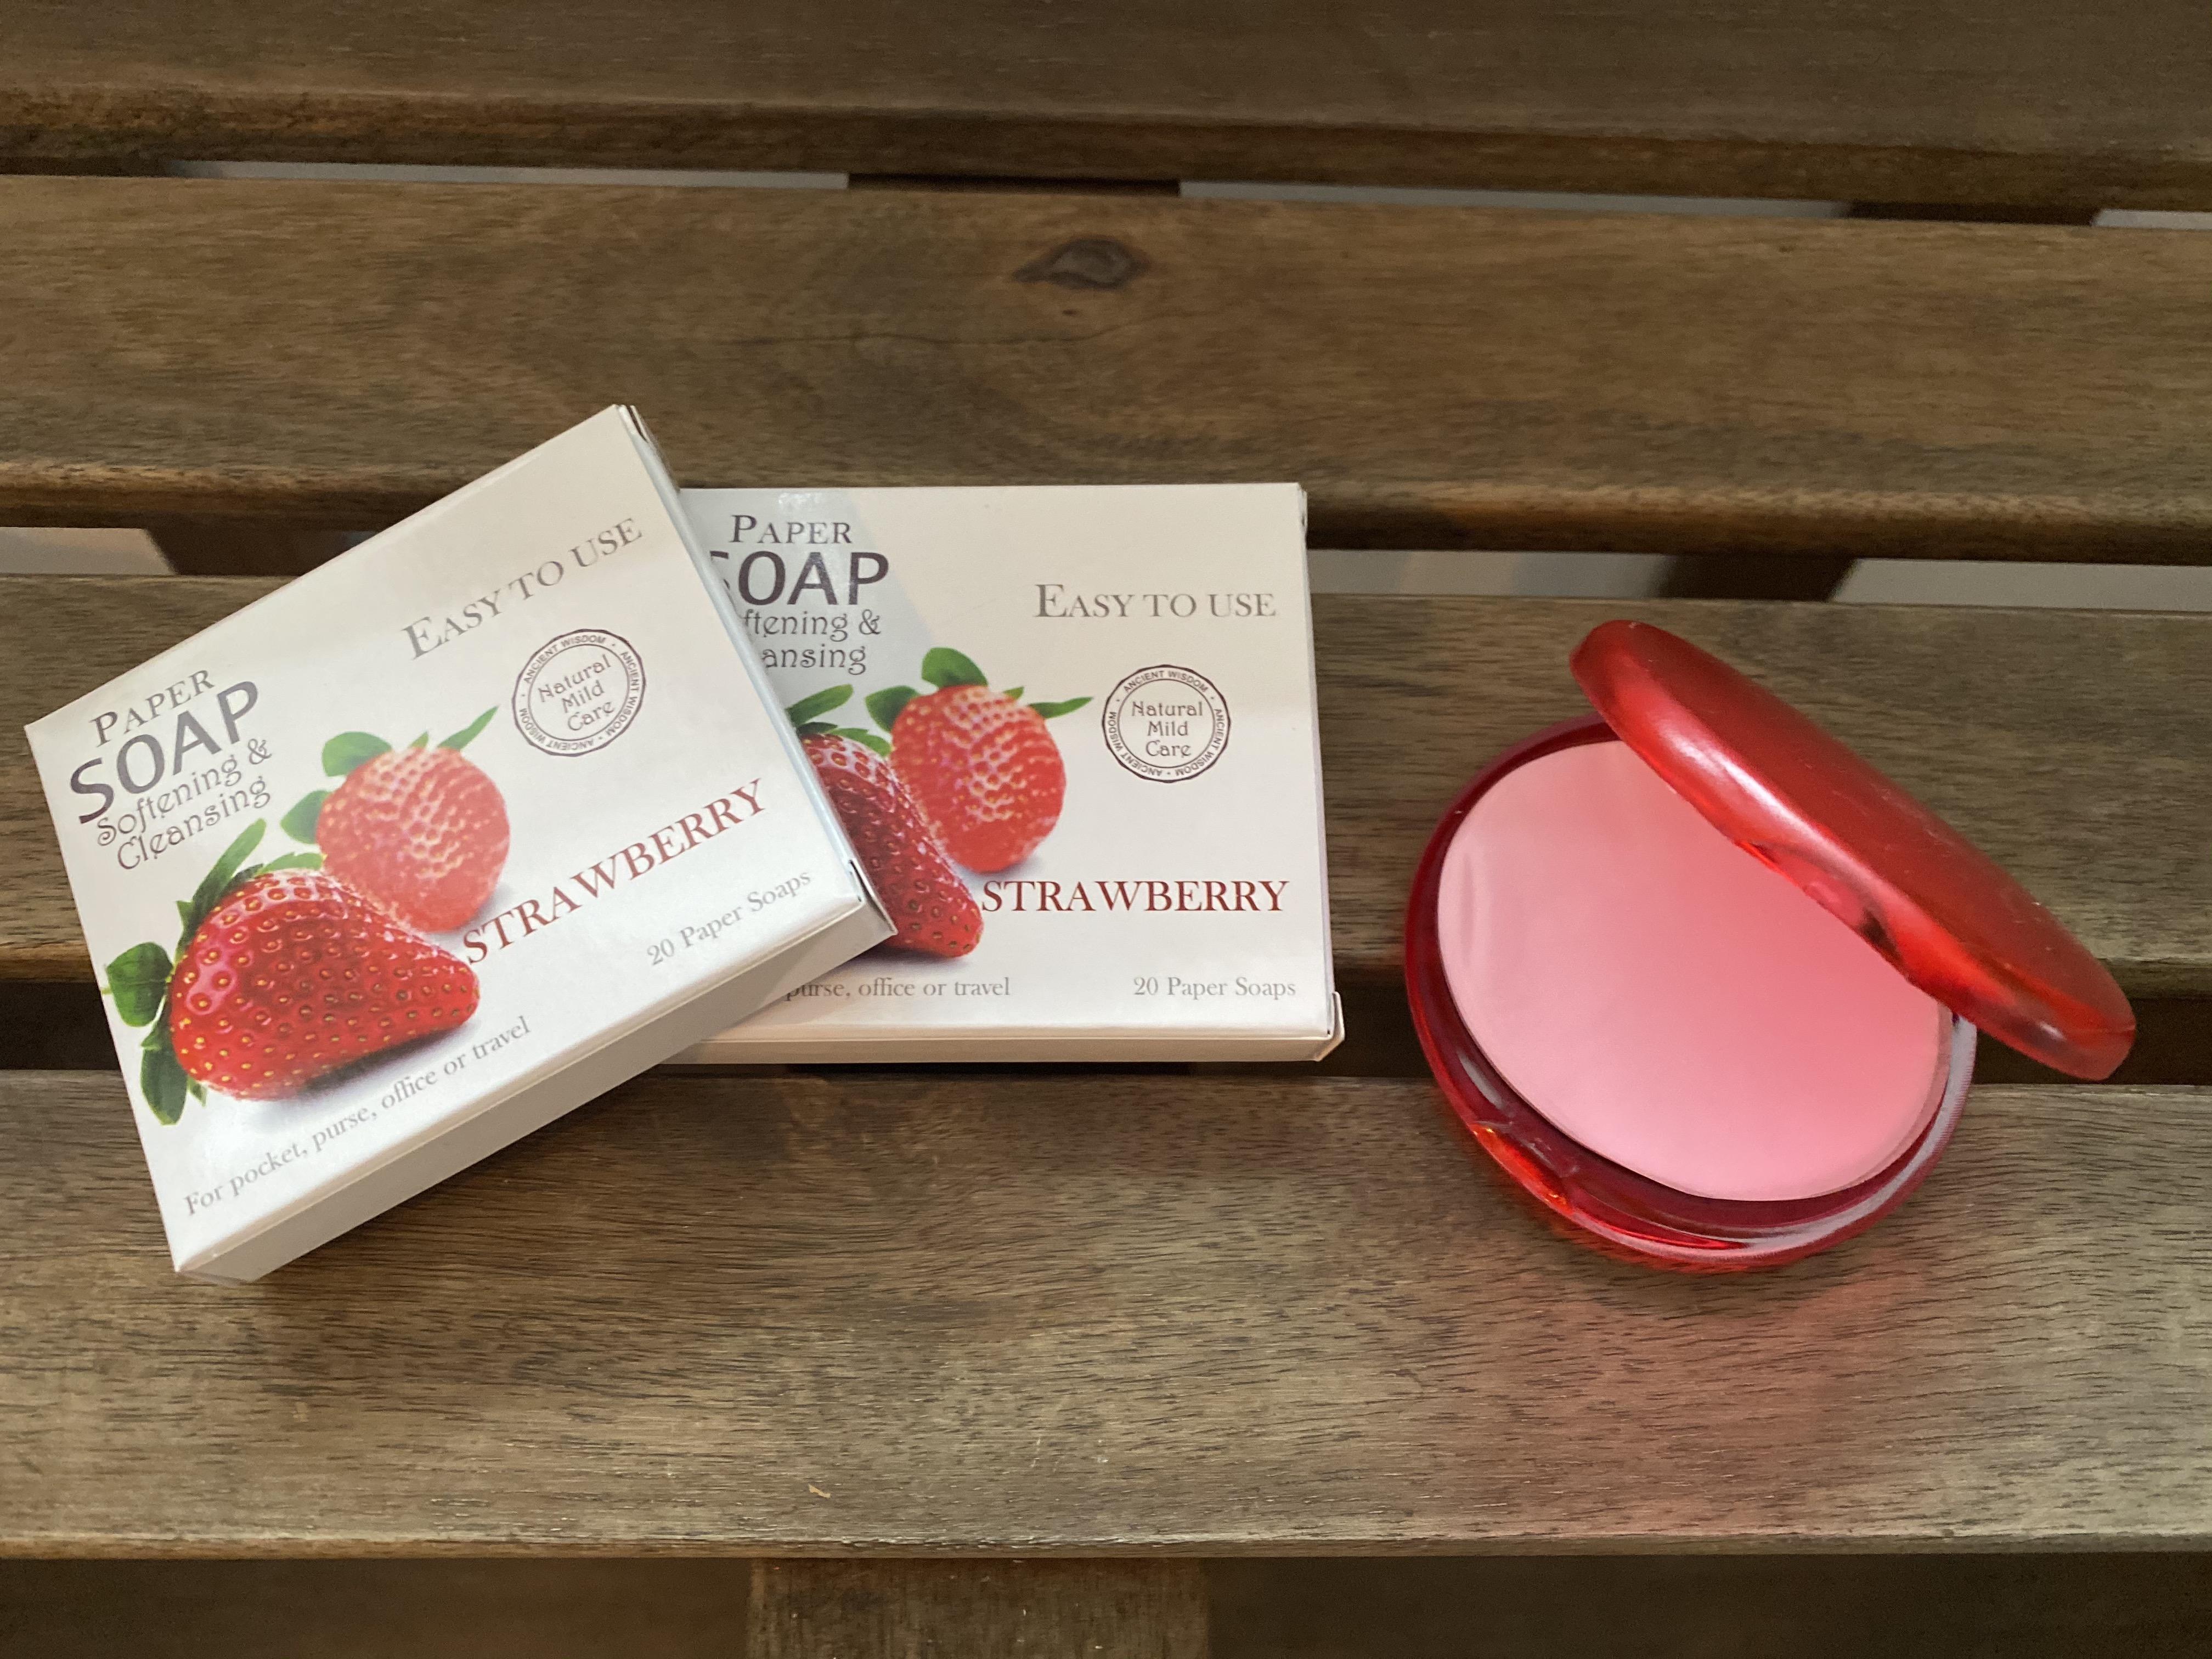 Paper Soap Strawberry